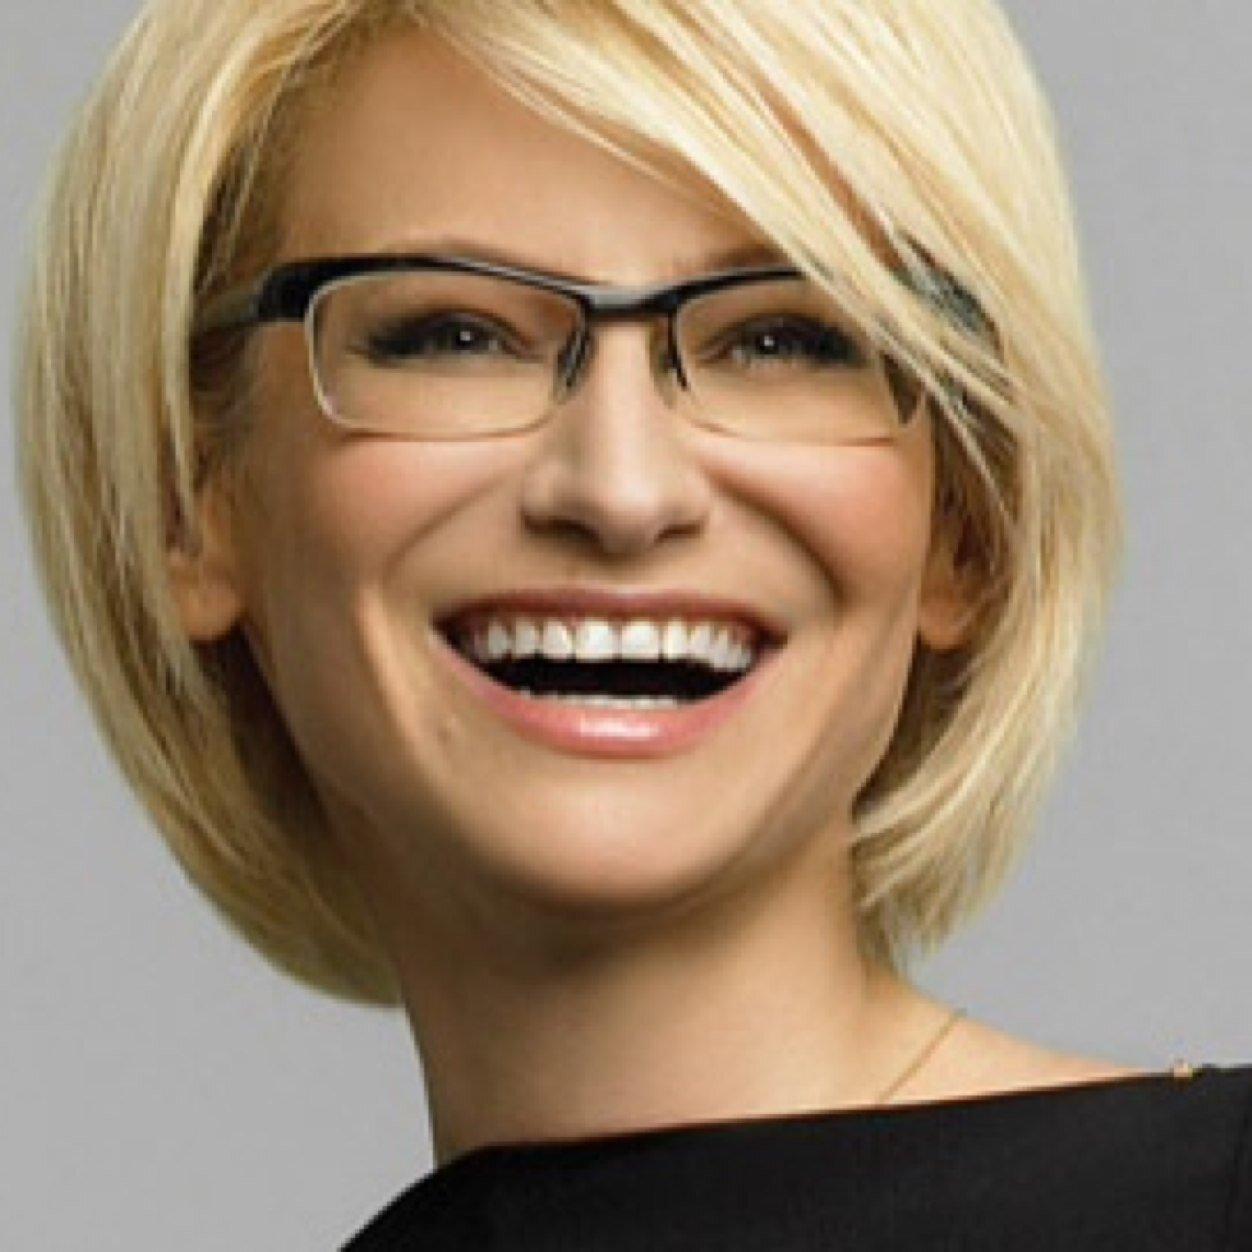 Женские стрижки для тех кто носит очки